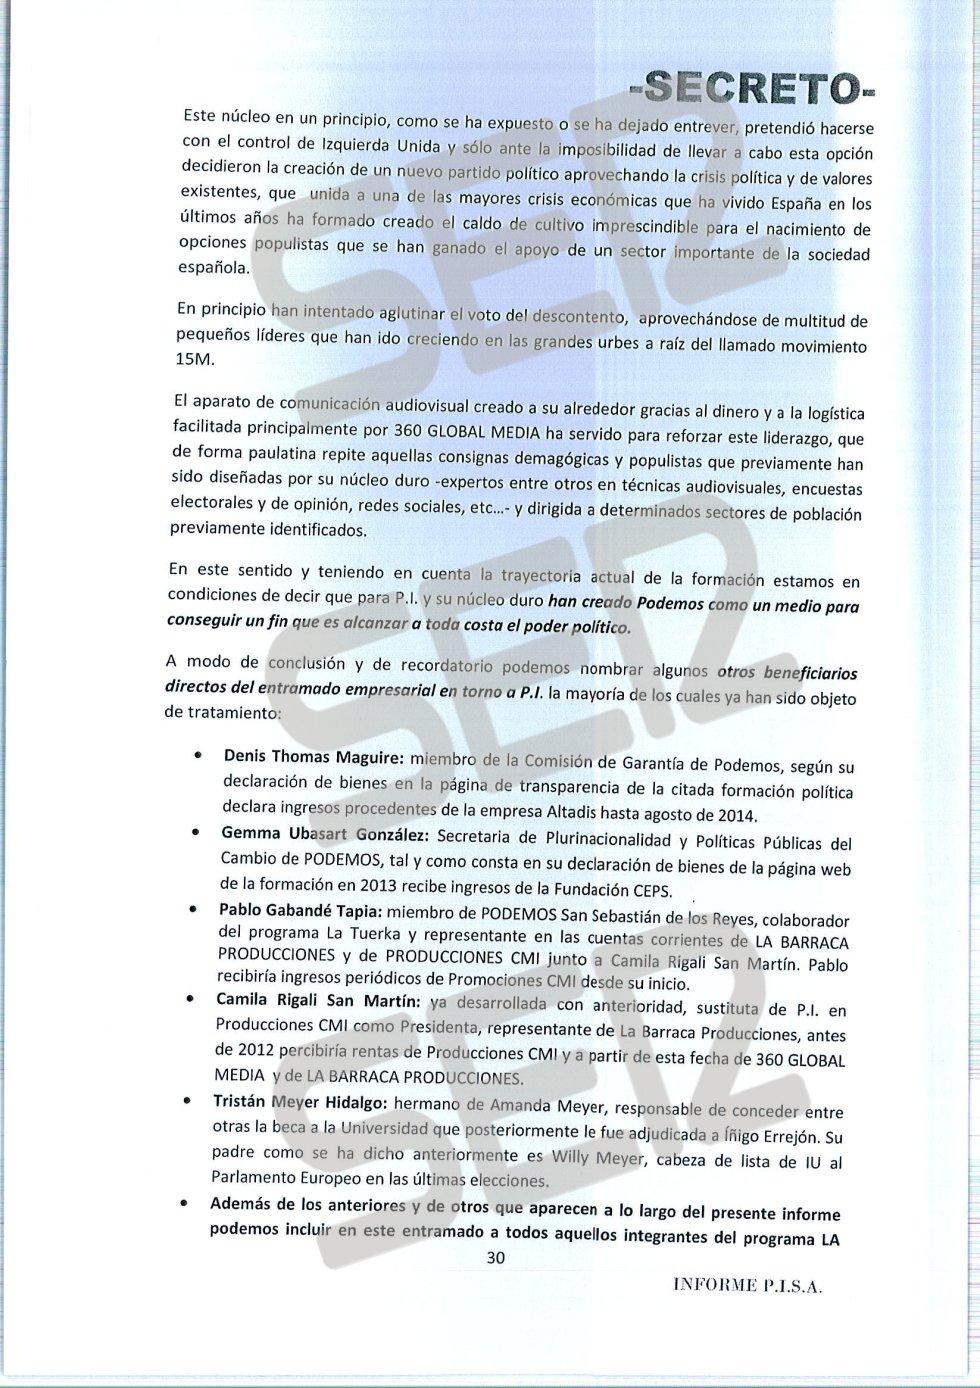 'Informe PISA' (Pablo Iglesias S.A.) de la UDEF.